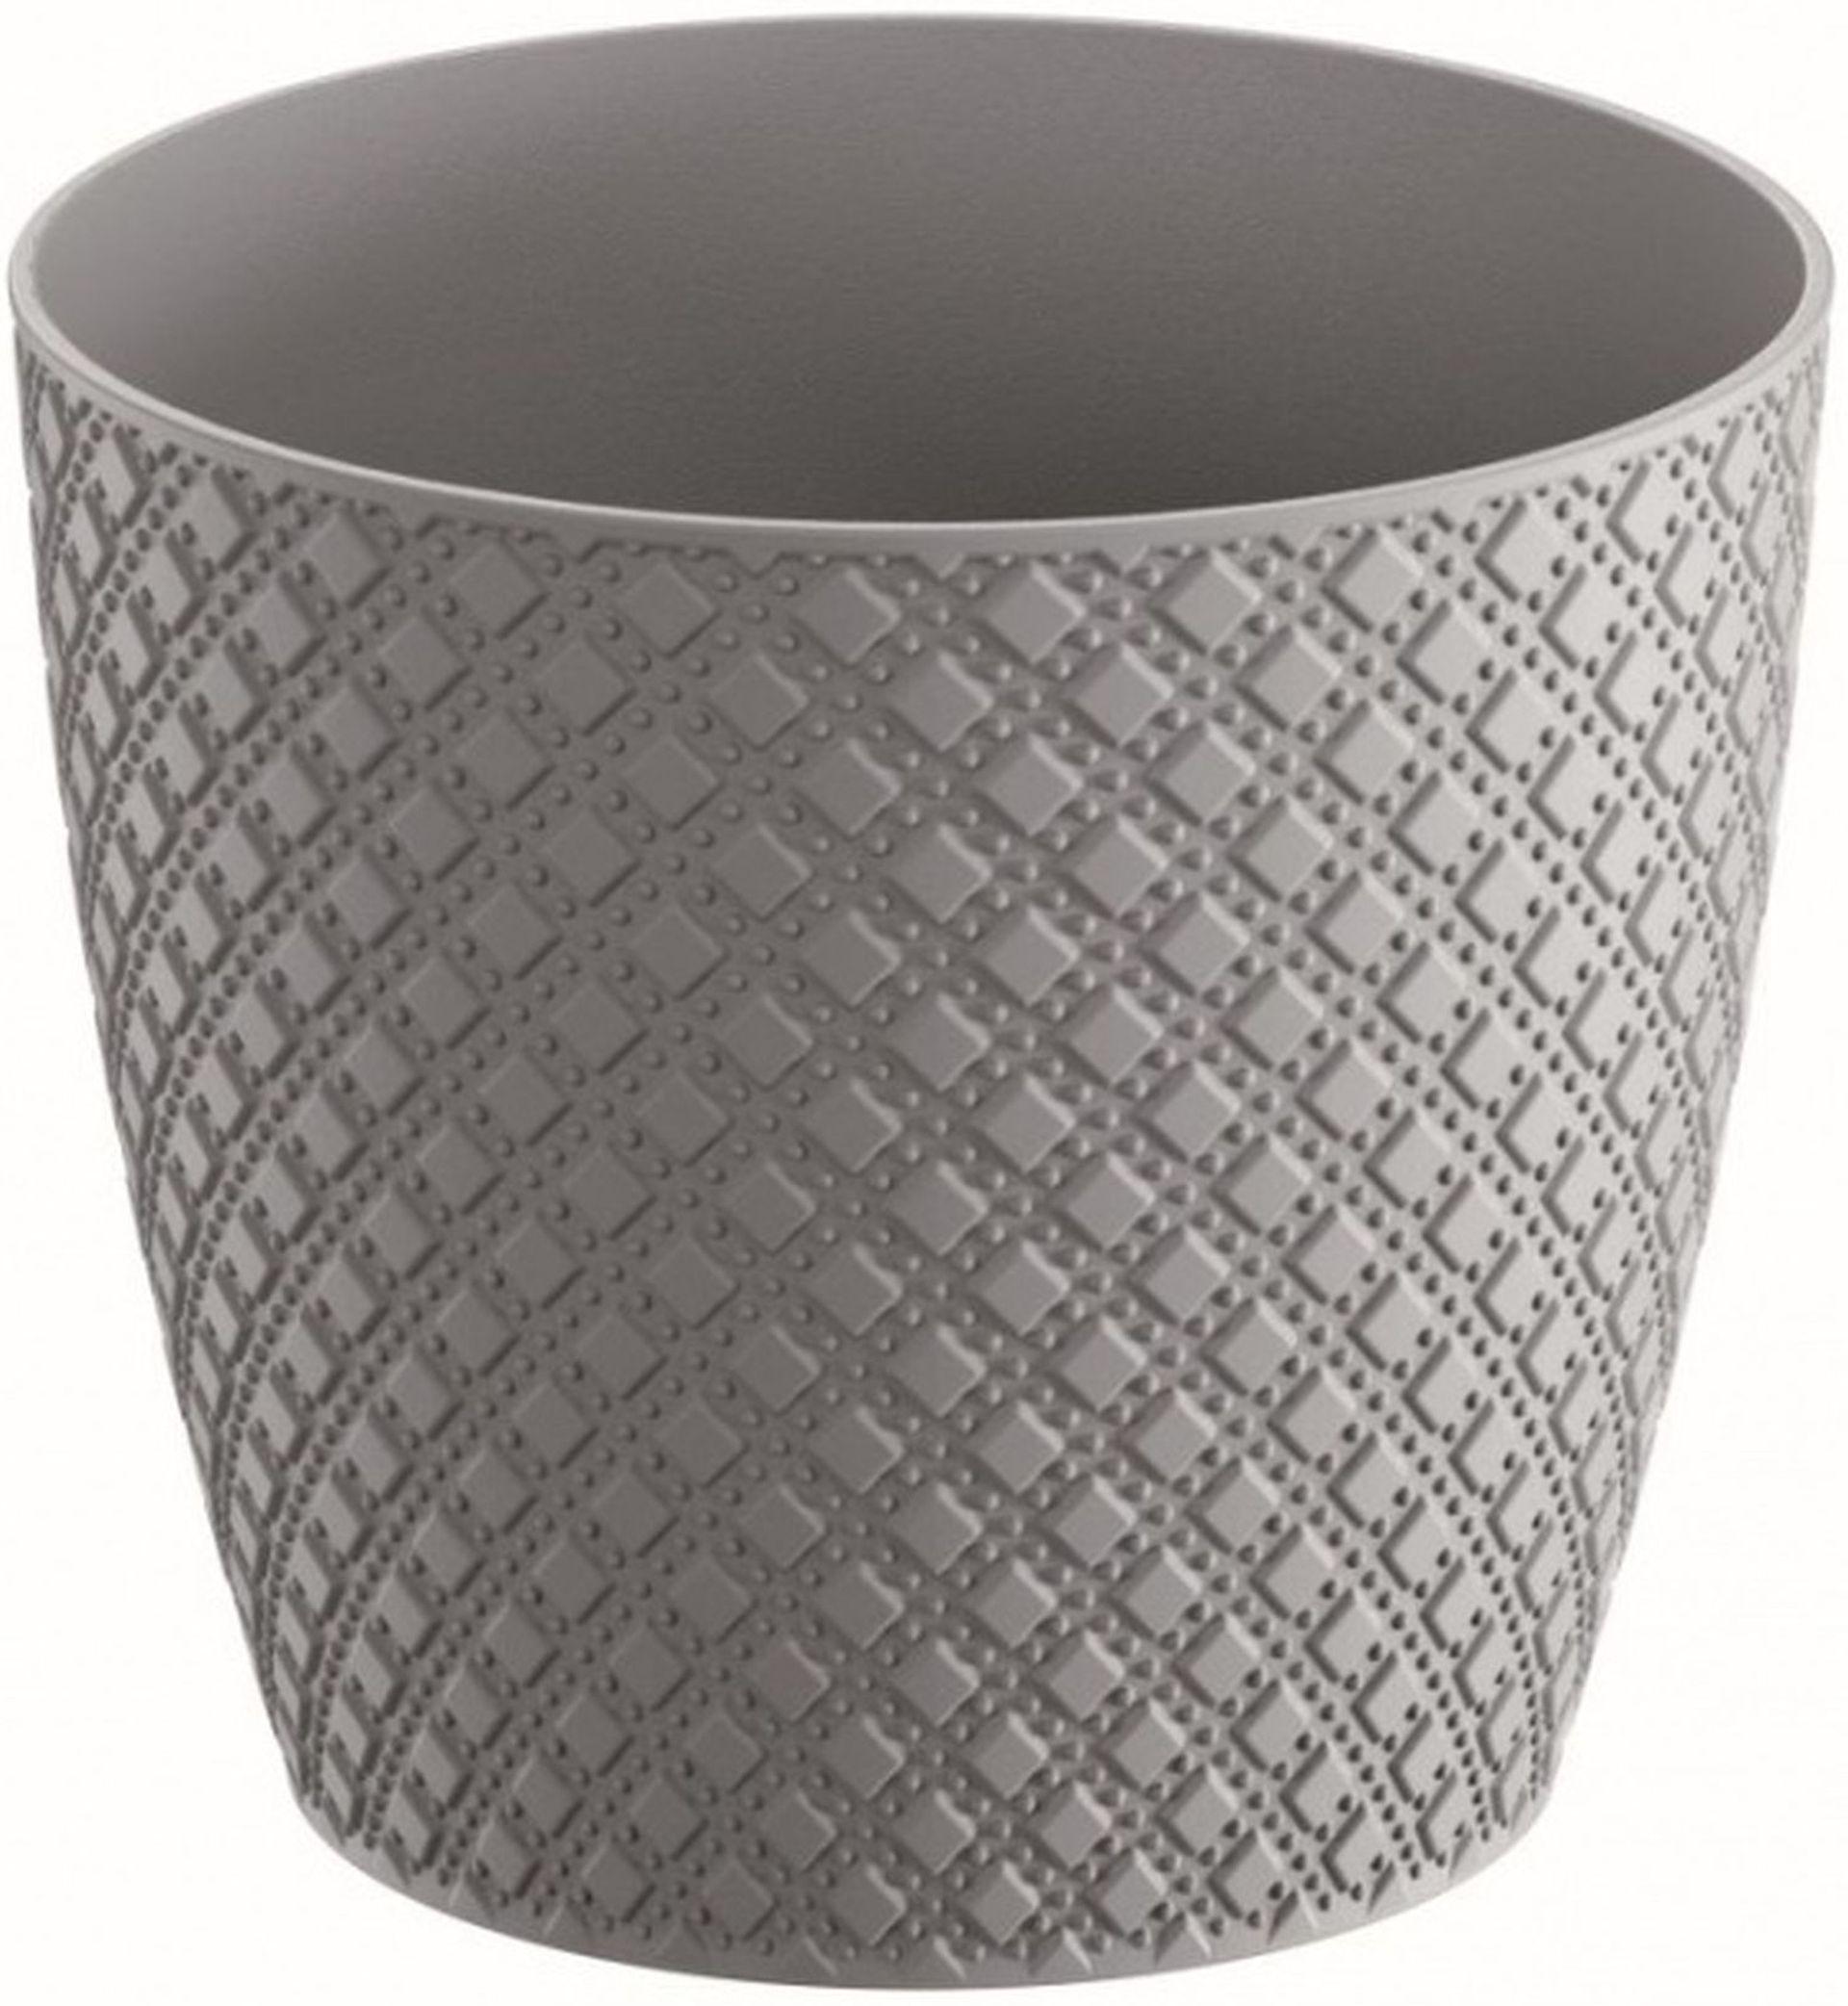 Prosperplast ORIENT Květináč 25,8 cm, šedá kámen DOR260